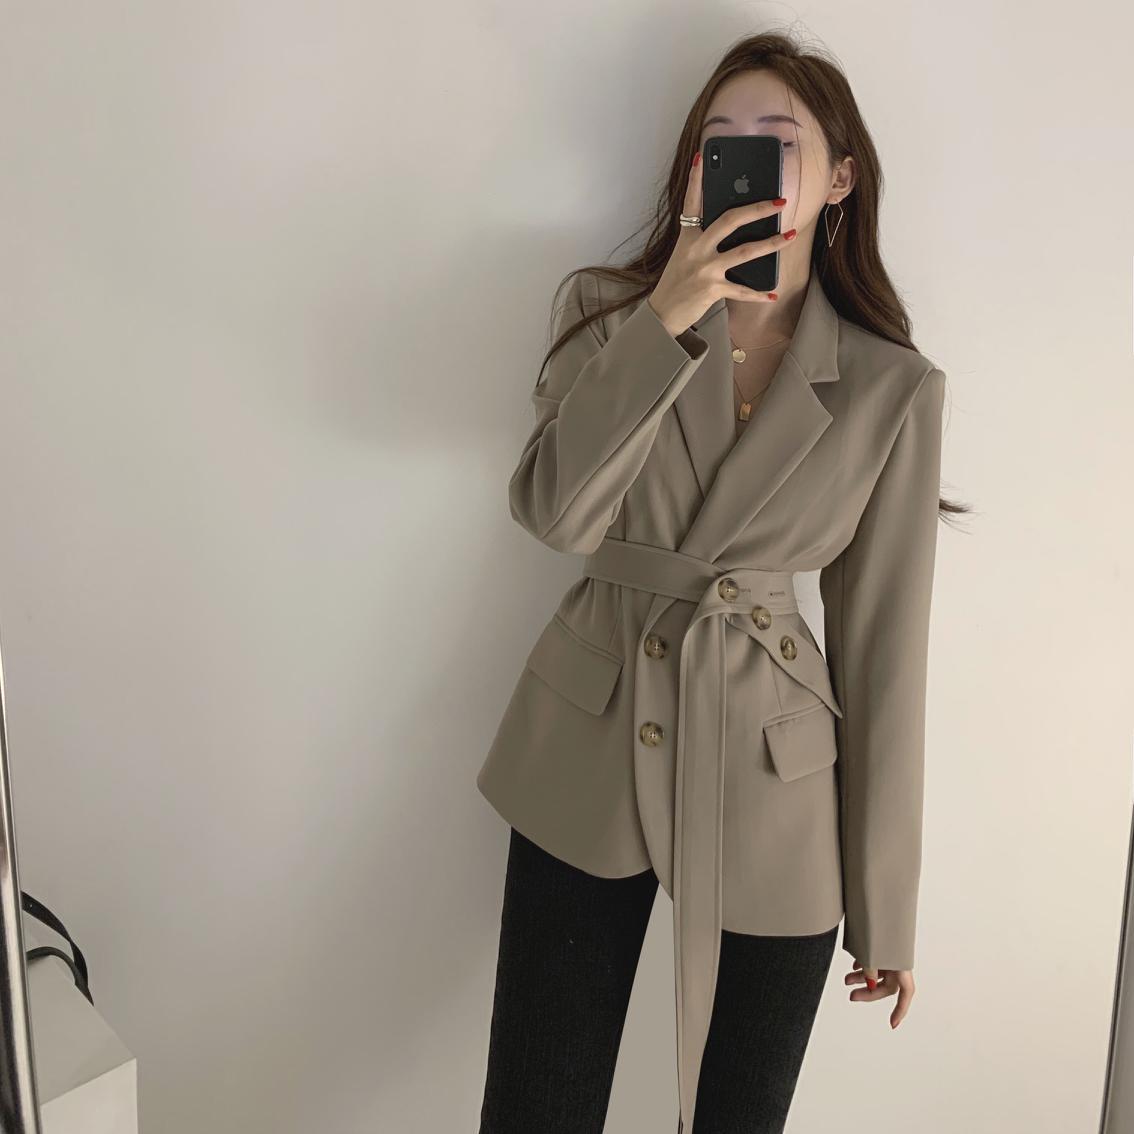 Women Lace Up Blazer Coat Slim Female Suit Jacket Elegant Office Lady Work Style  Outerwear Femme Autumn Blazer